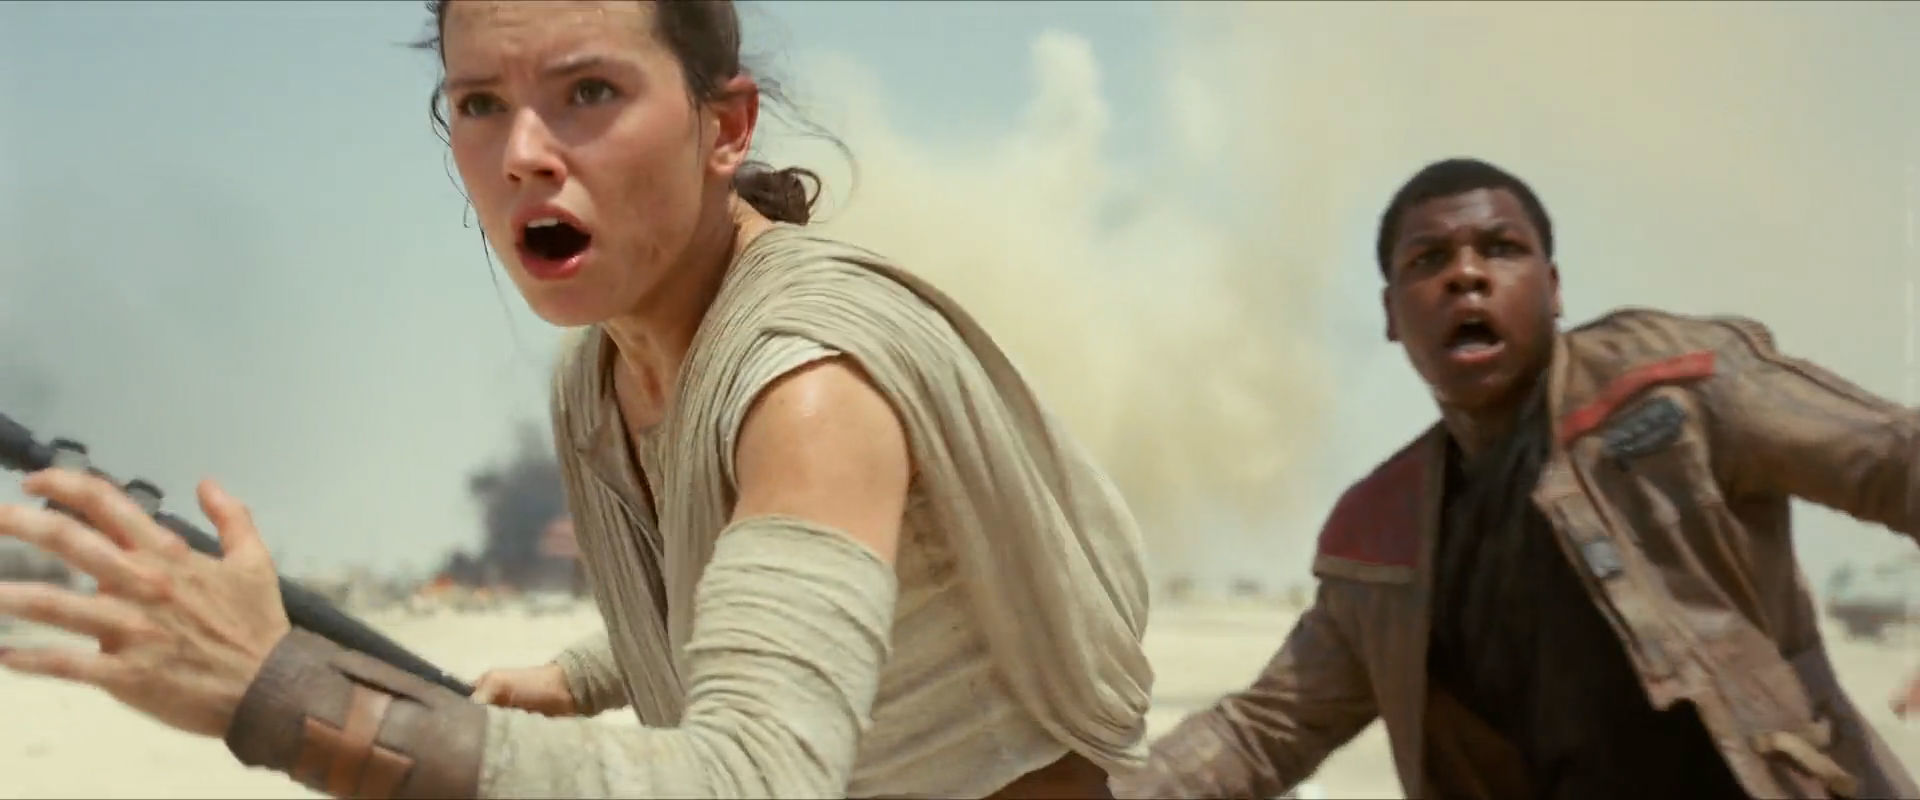 Star Wars: Episode VII - The Force Awakens - Trailer